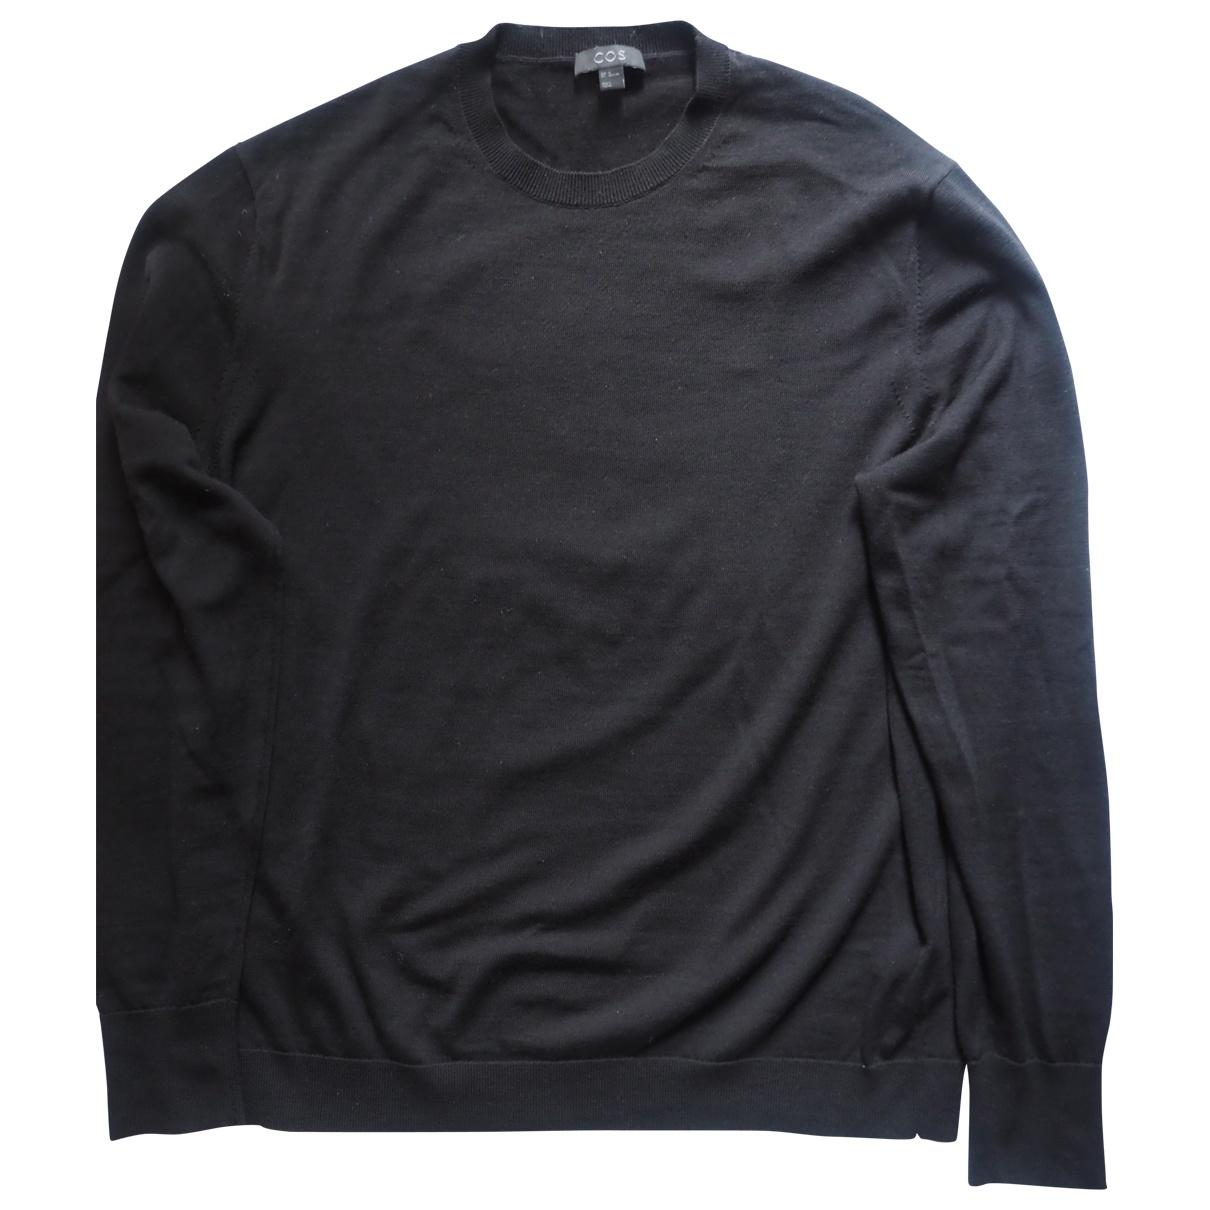 Cos \N Black Wool Knitwear & Sweatshirts for Men XL International